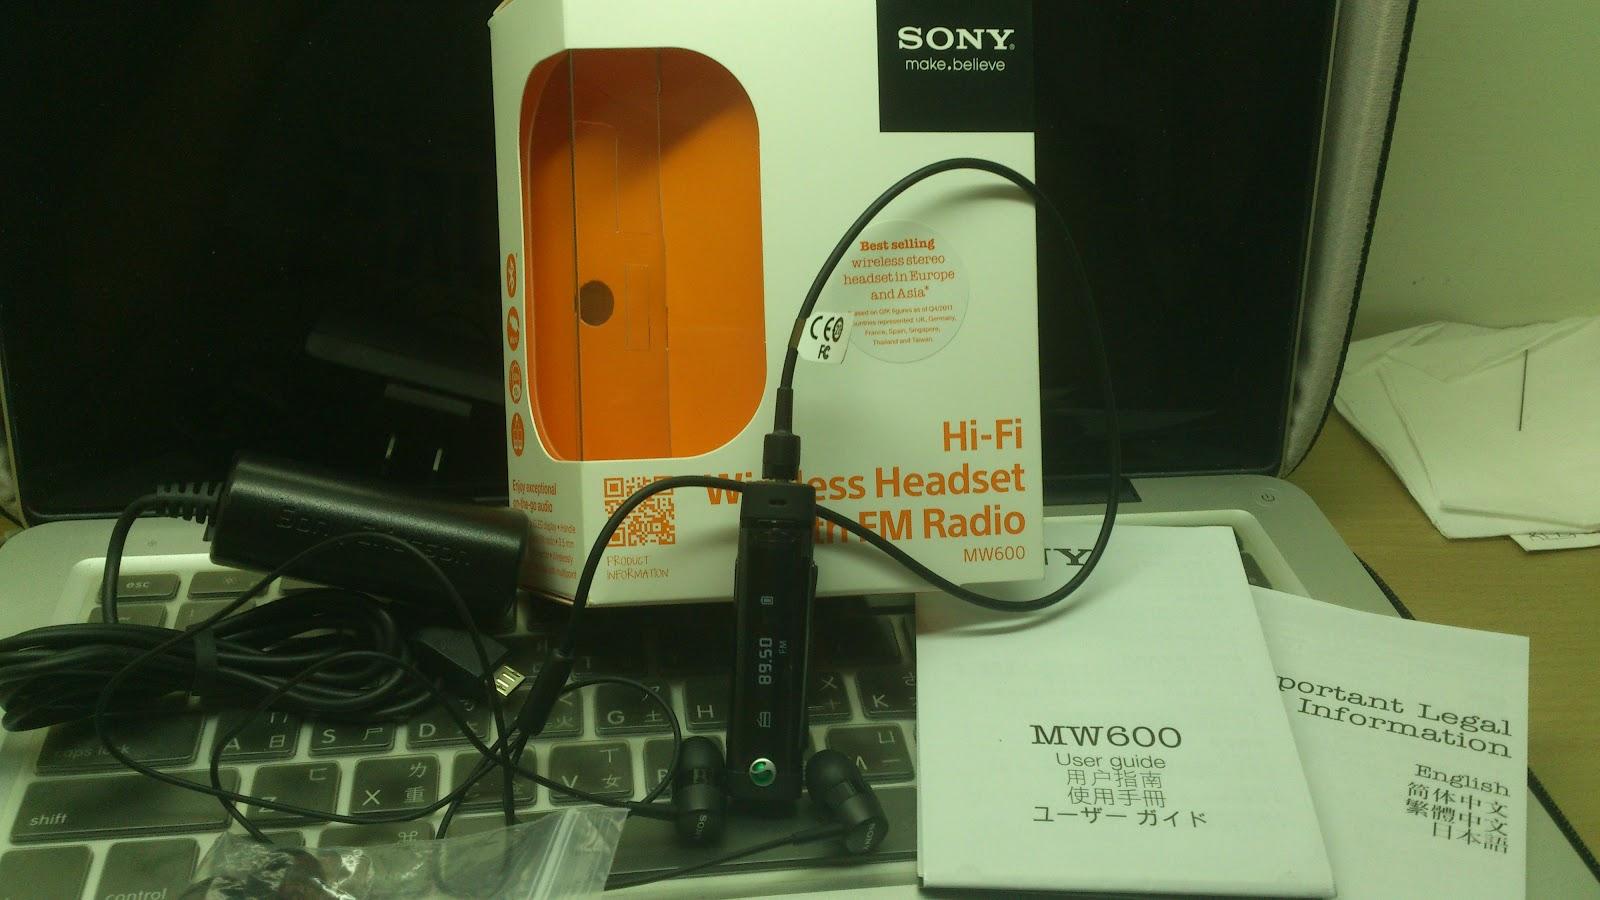 MW600 升級版 藍芽耳機開箱 - Mobile01